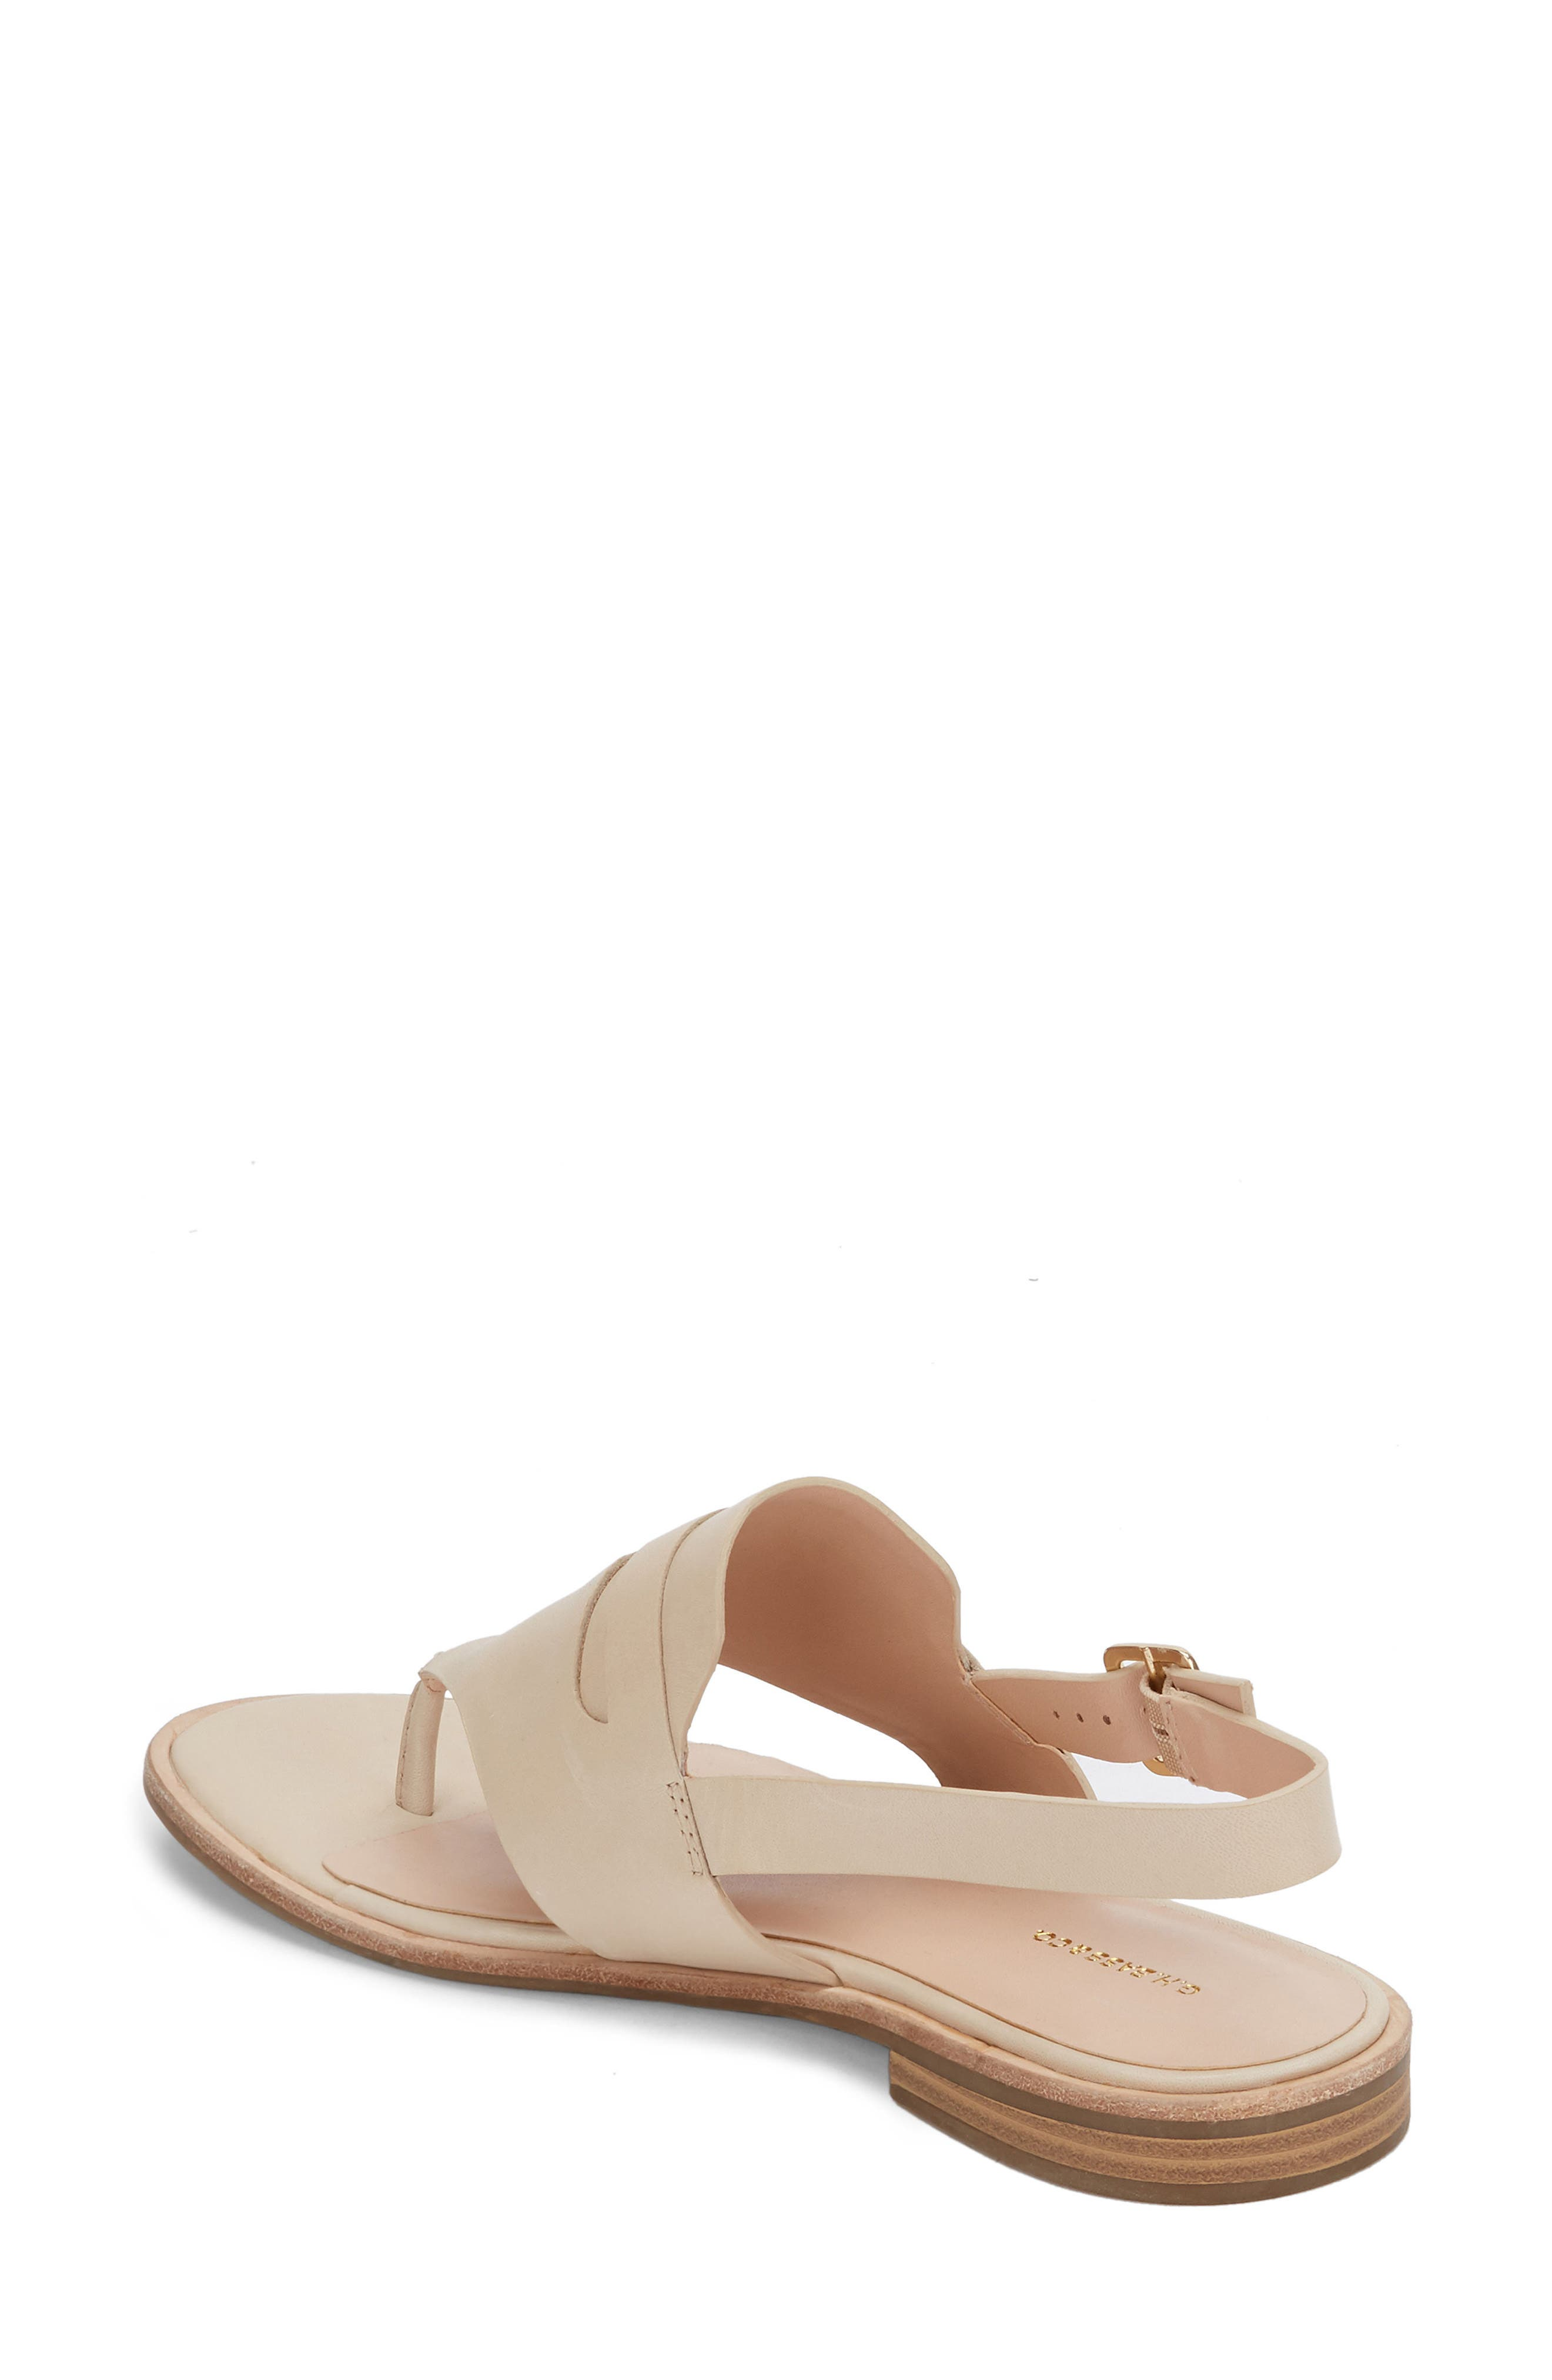 Maddie Slingback Sandal,                             Alternate thumbnail 2, color,                             Cream Leather